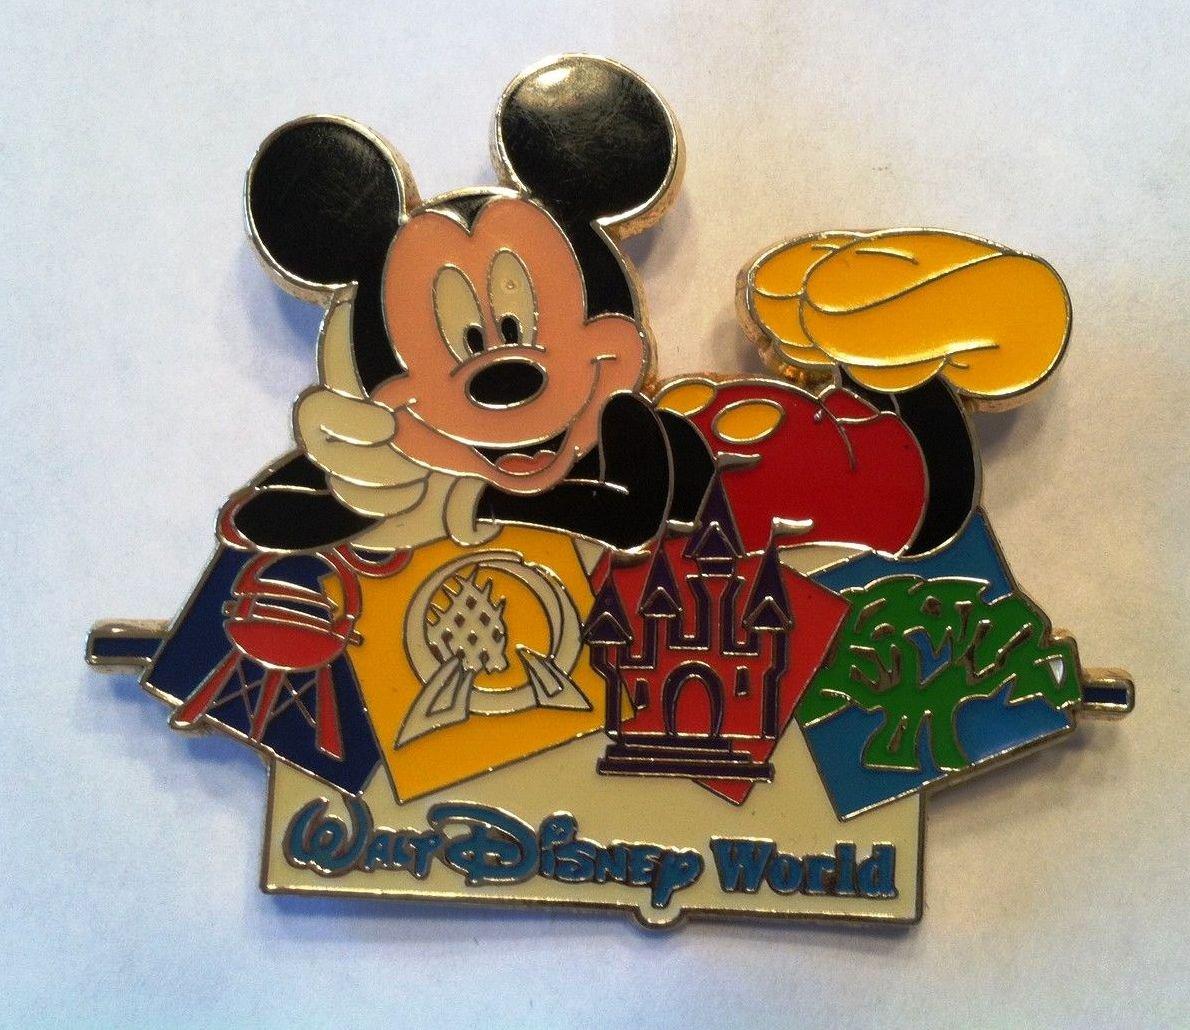 Disney Hard to Find Pin Jumbo Mickey Mouse Walt World Theme Park Icons